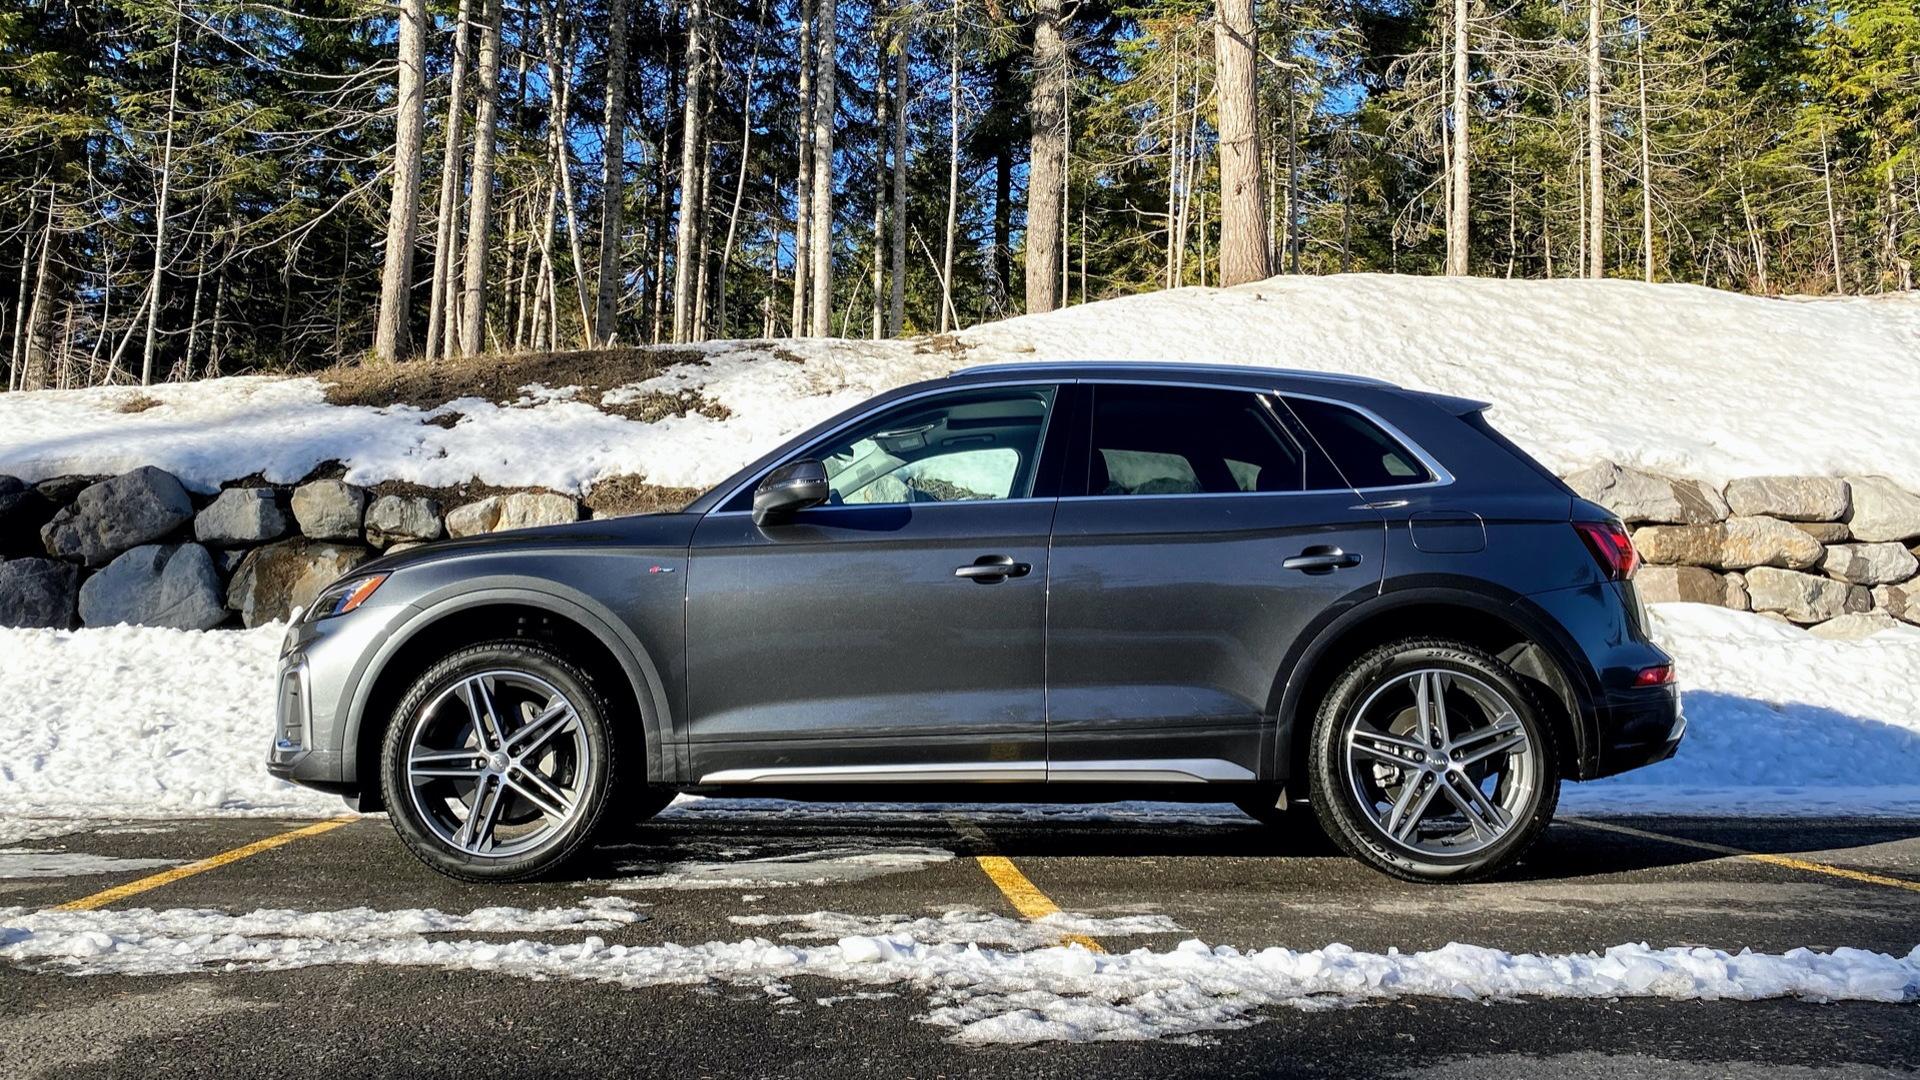 2021 Audi Q5 plug-in hybrid  -  First drive, December 2020